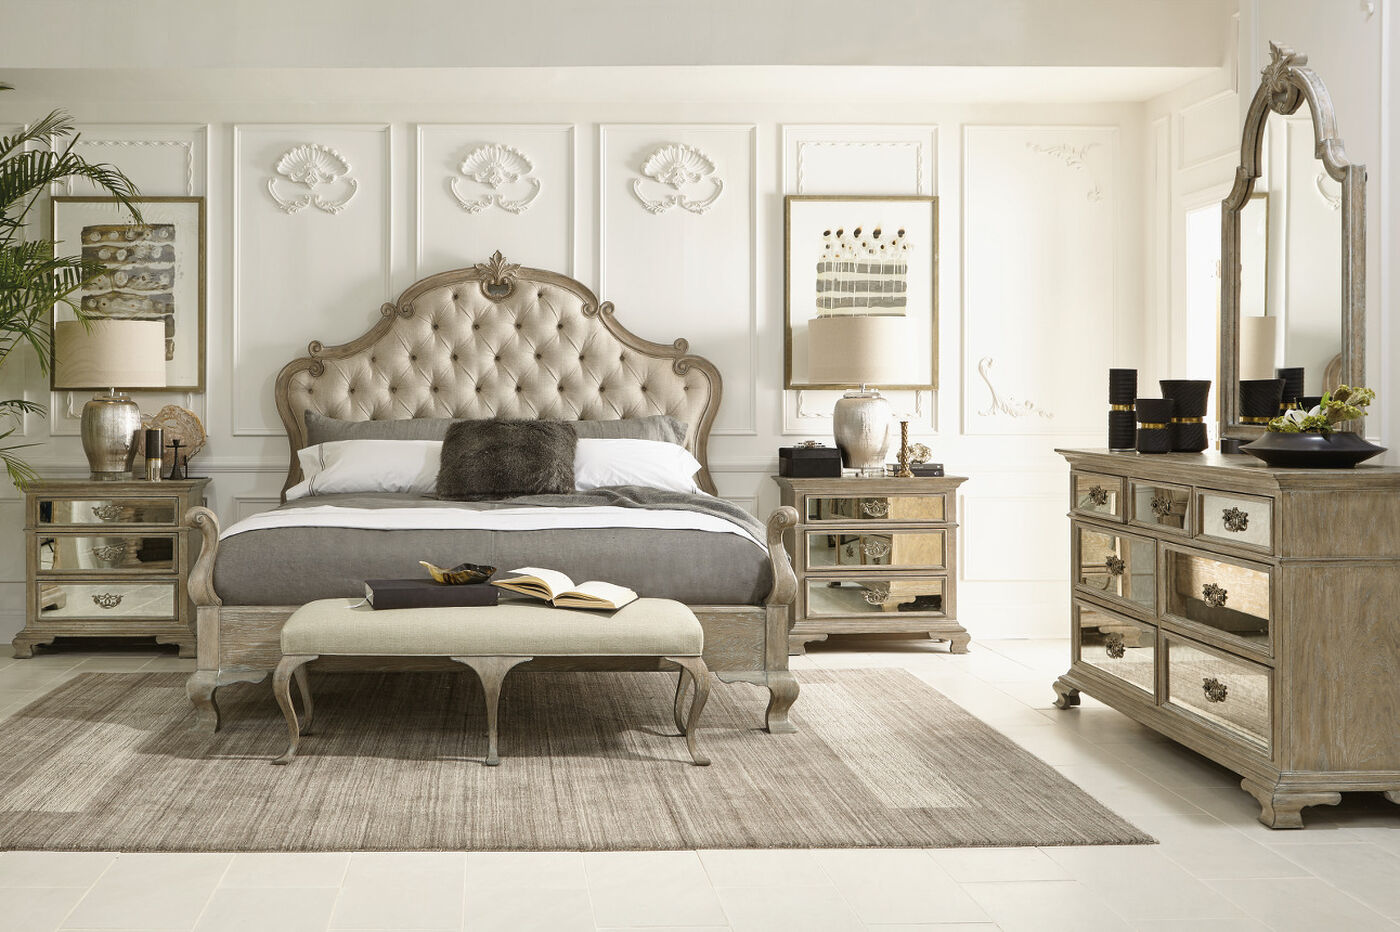 Emejing Bernhardt Bedroom Furniture Pictures Home Design Ideas